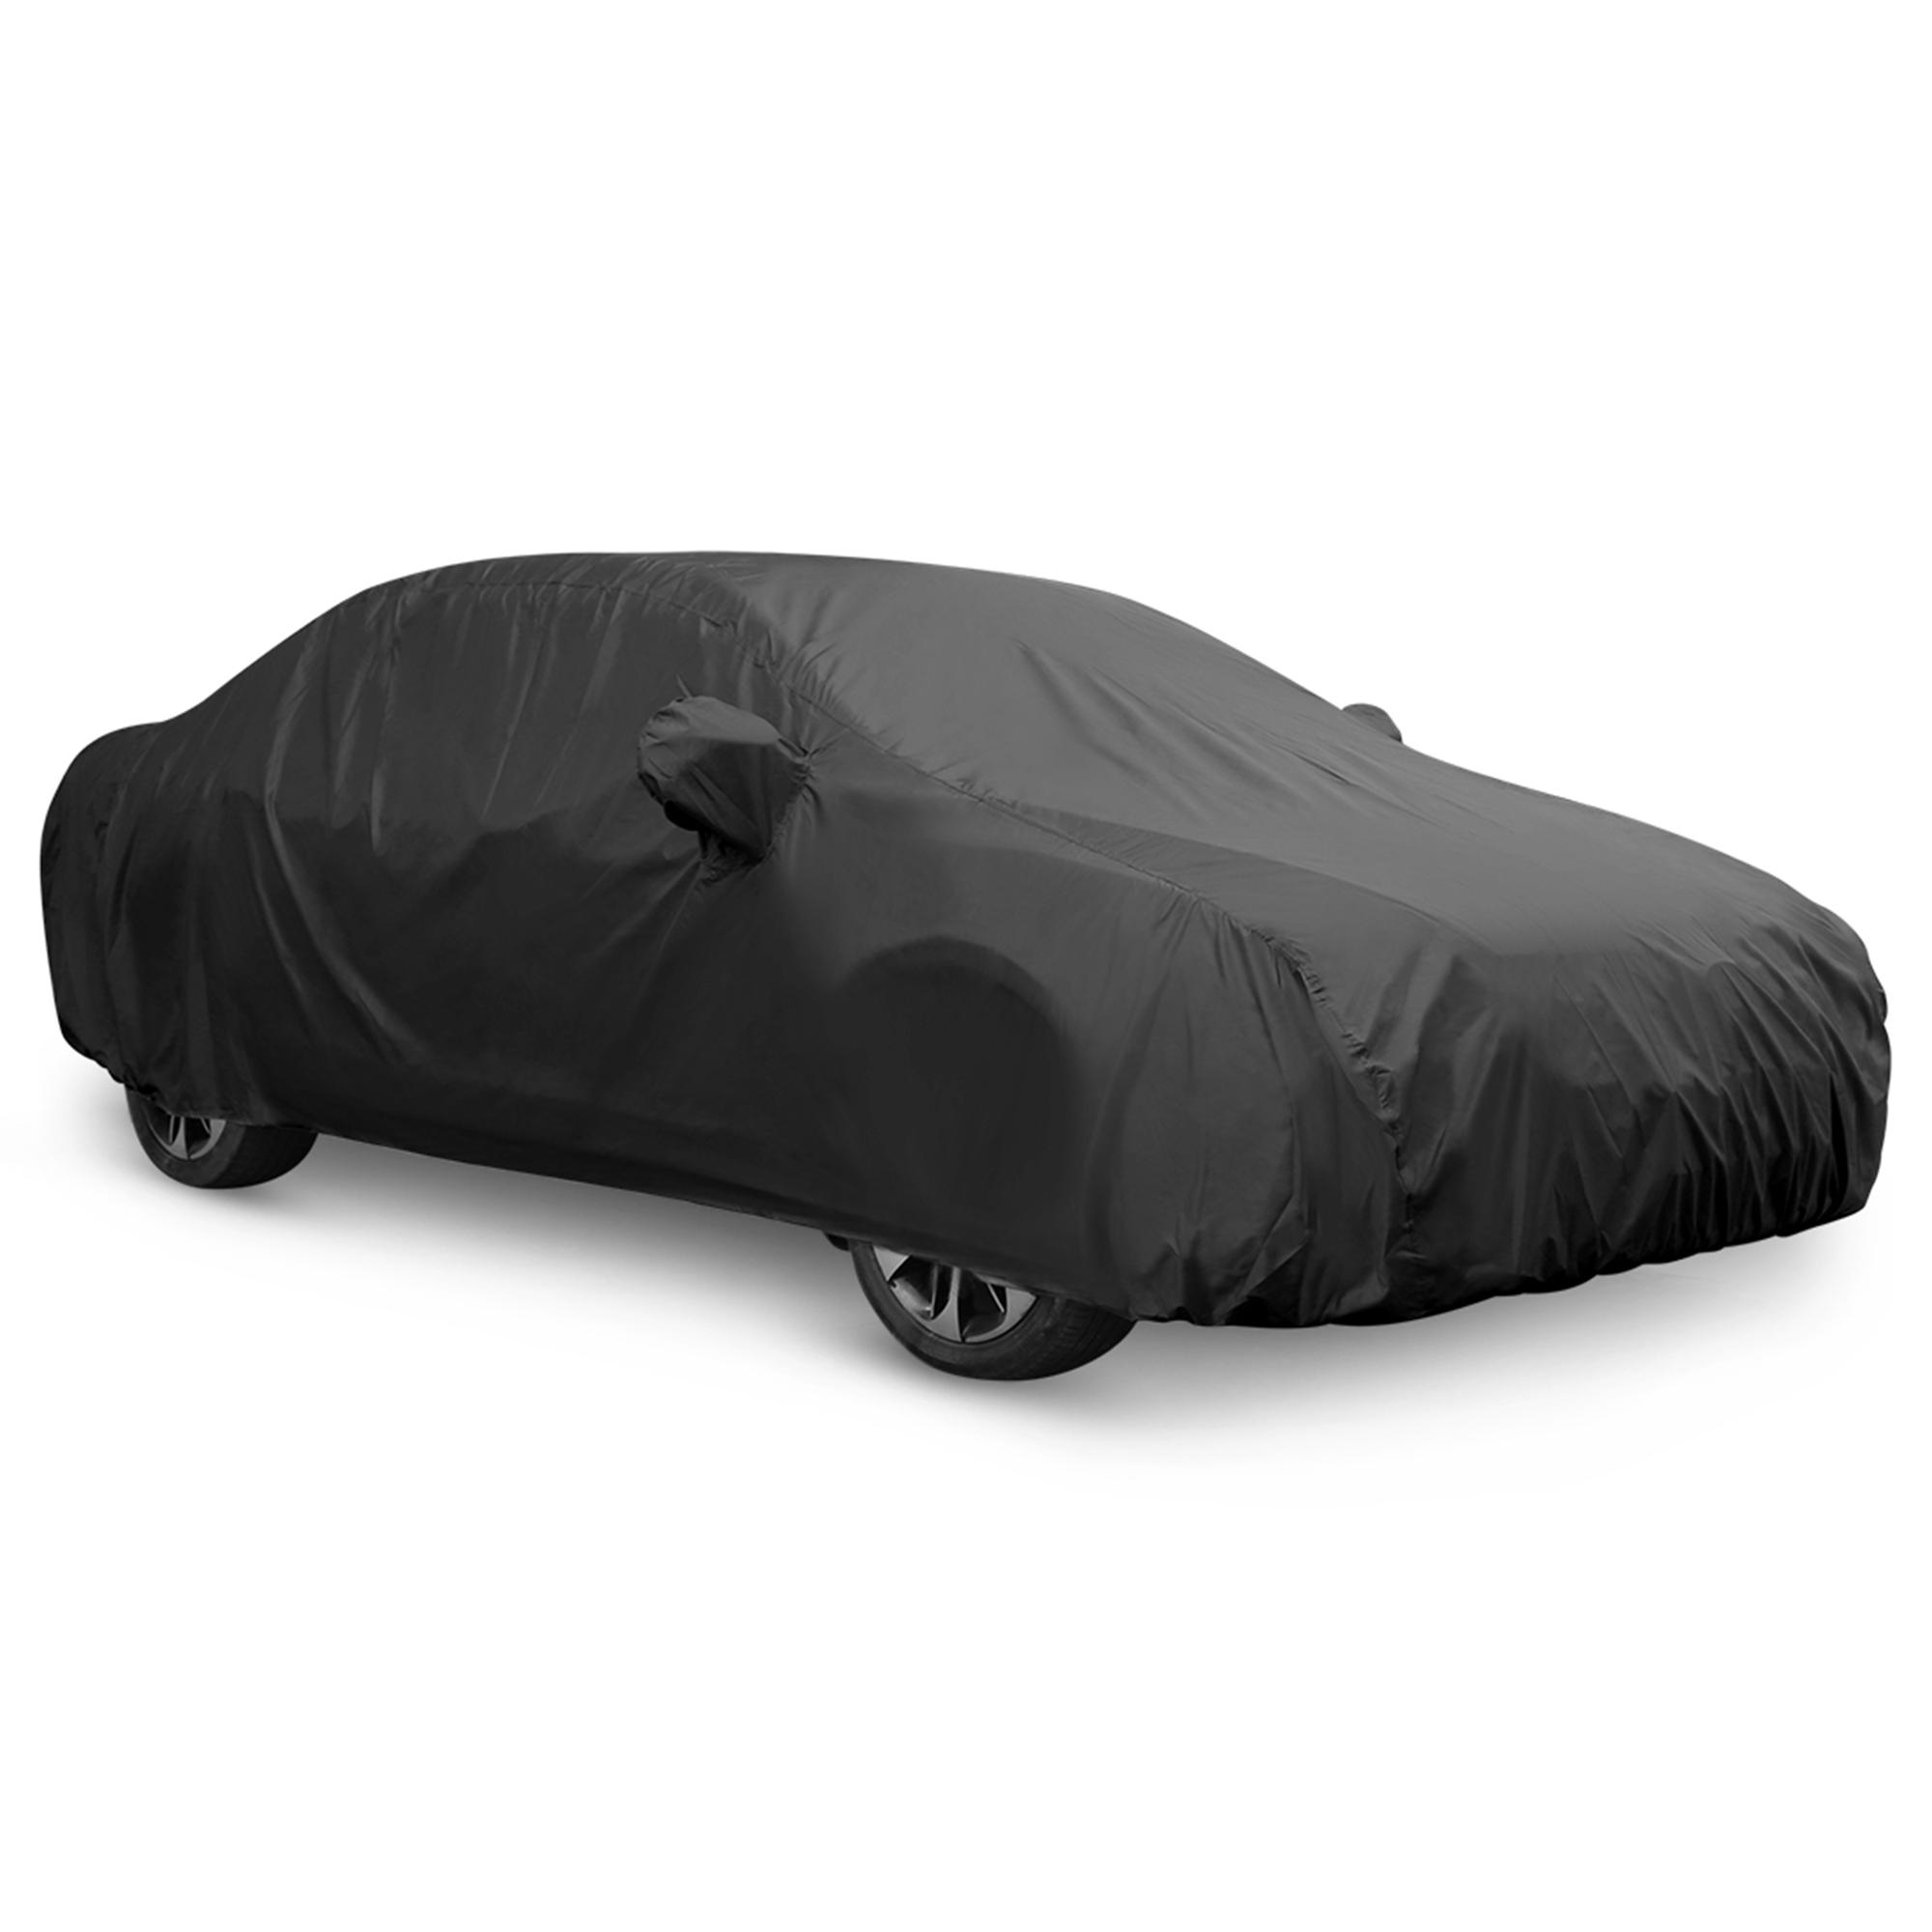 Black Breathable Waterproof Car Cover w Mirror Pocket 3XL